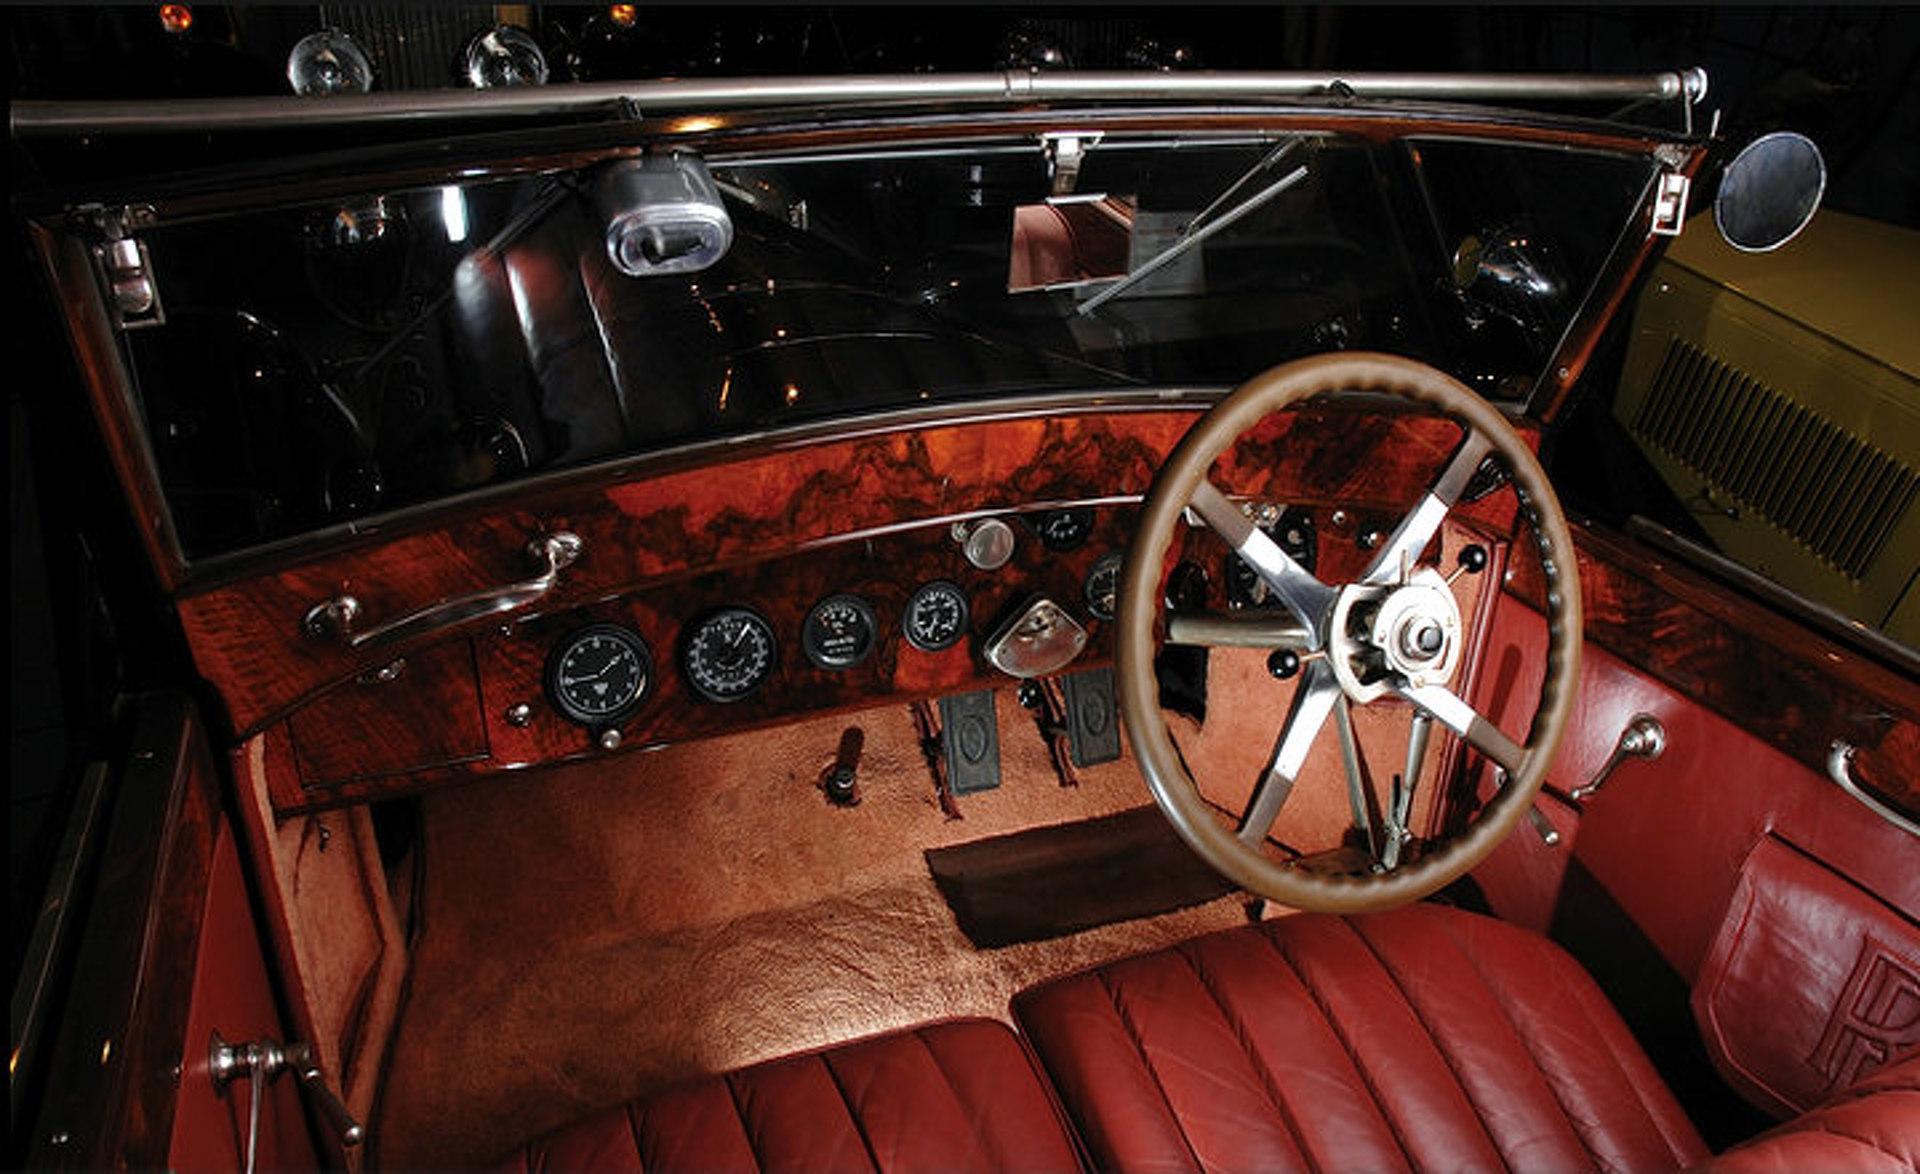 Rolls-Royce Phantom I: A Priceless Gem from the Age of Elegance